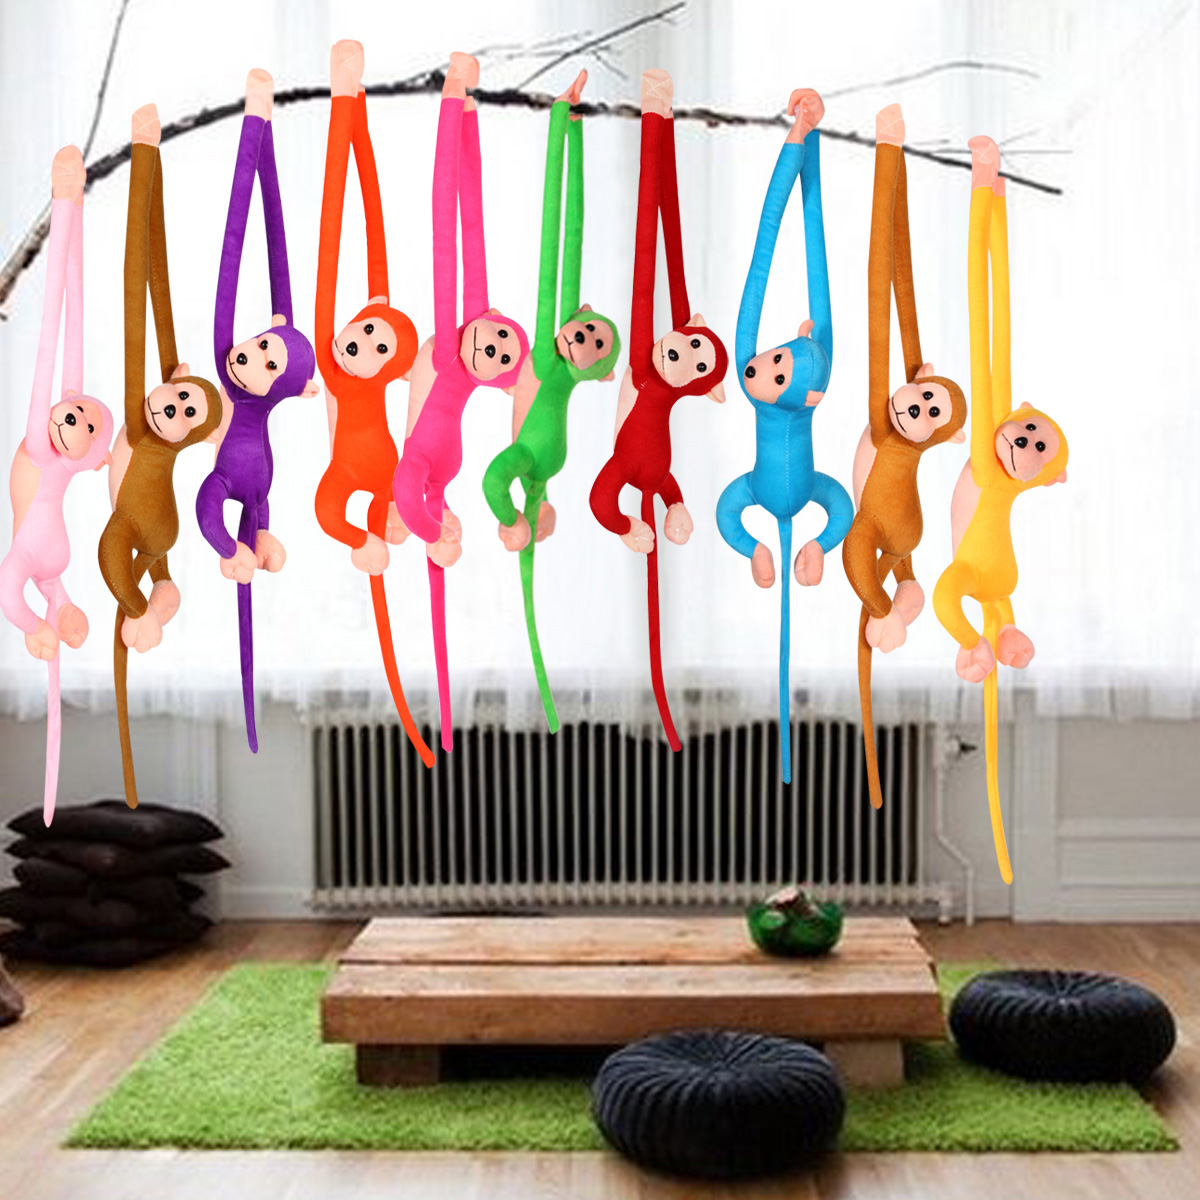 70CM Sound Hanging Monkey Long Arm Plush Baby Toys Stuffed Animal Doll Kids Gift Home Decoration Stuffed Animal Toy